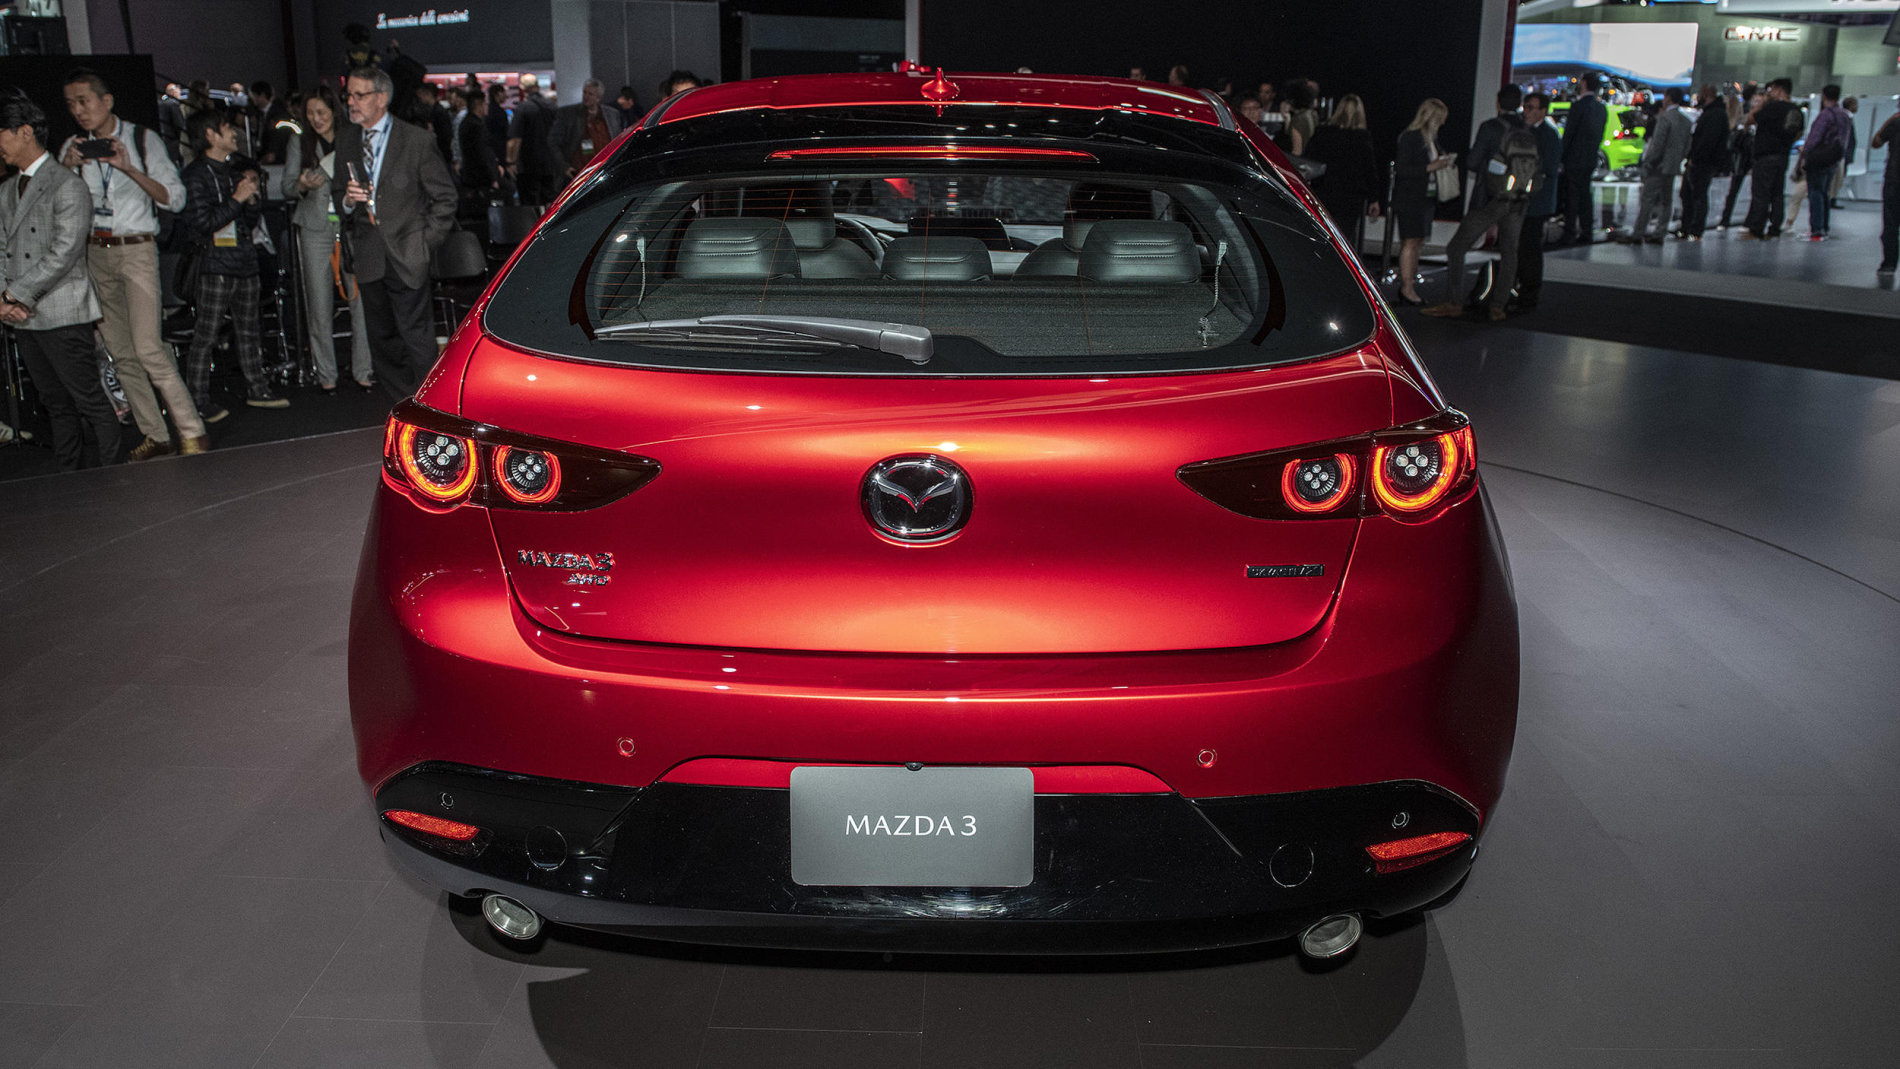 Noua Mazda3 - Poze Reale - Noua Mazda3 - Poze Reale